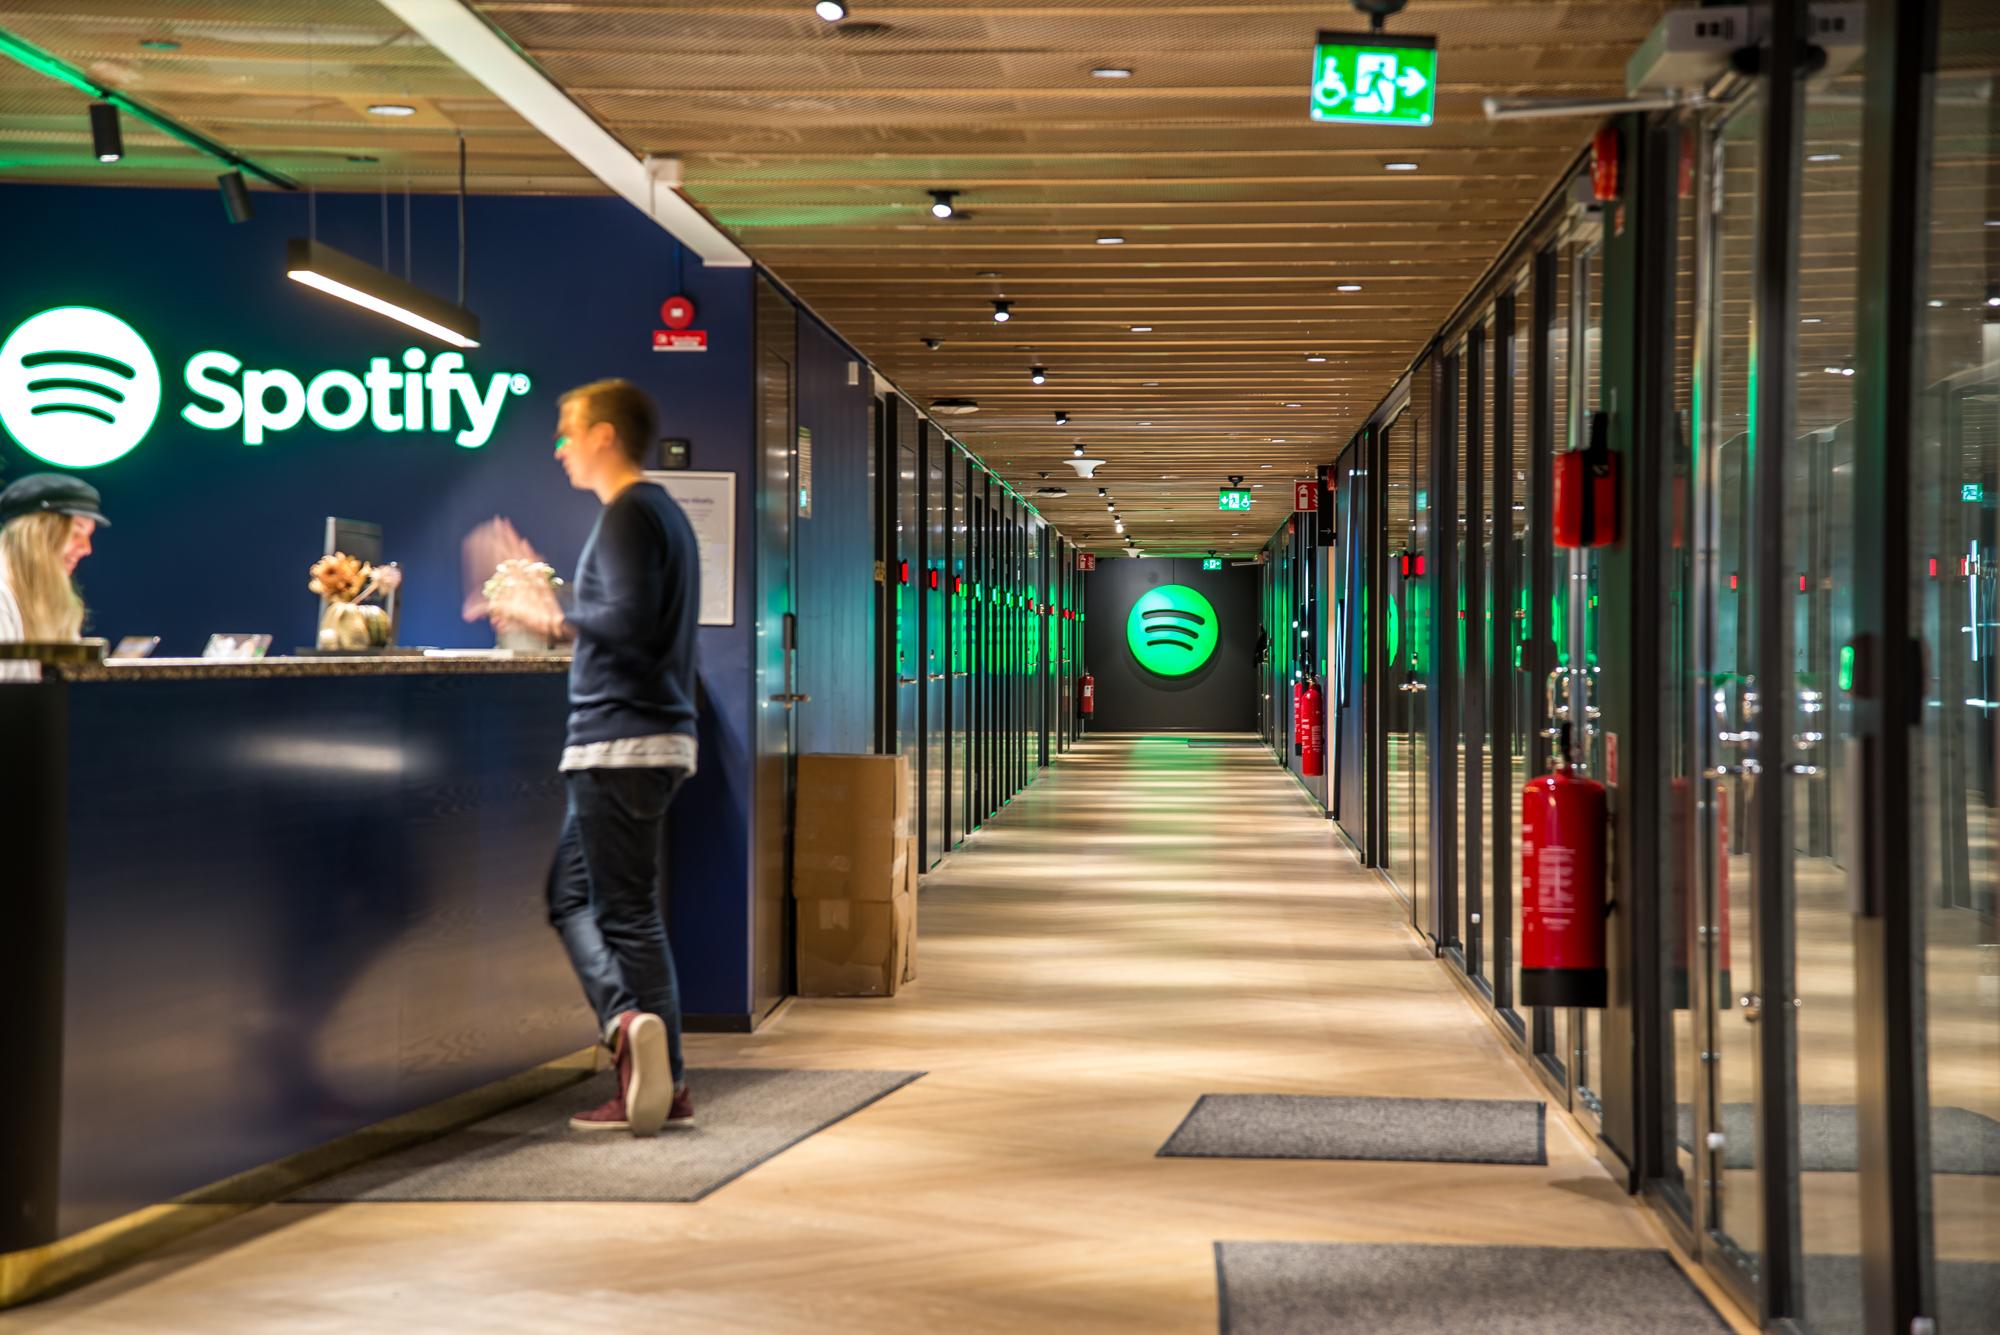 Spotify — Stockholm Office Tour